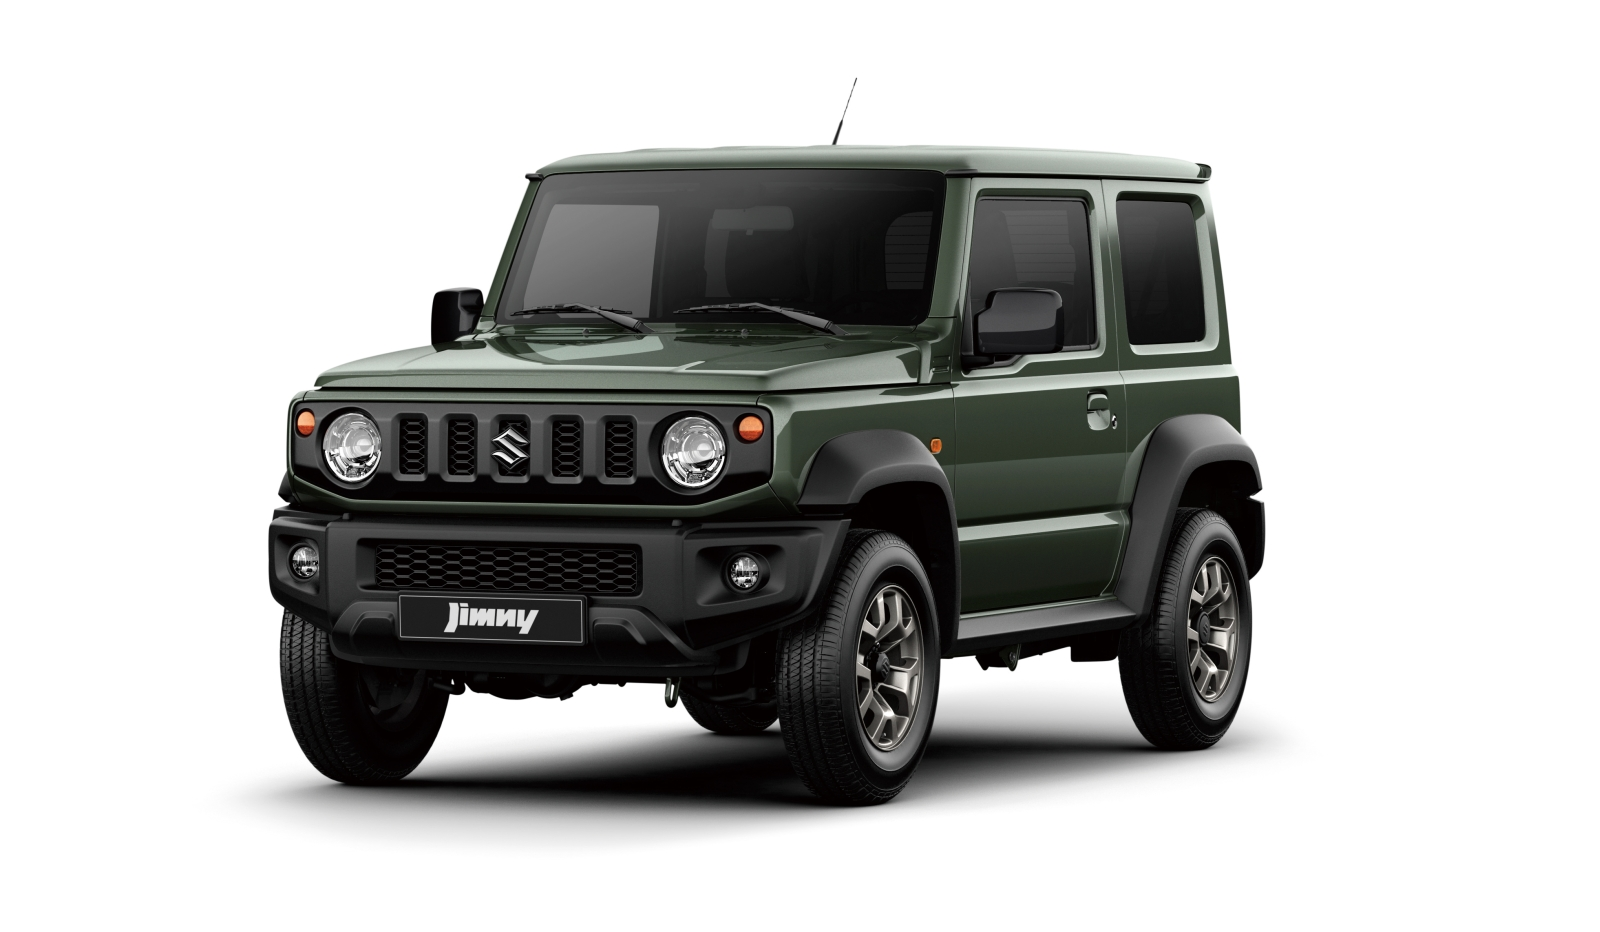 Suzuki Jimny - Select